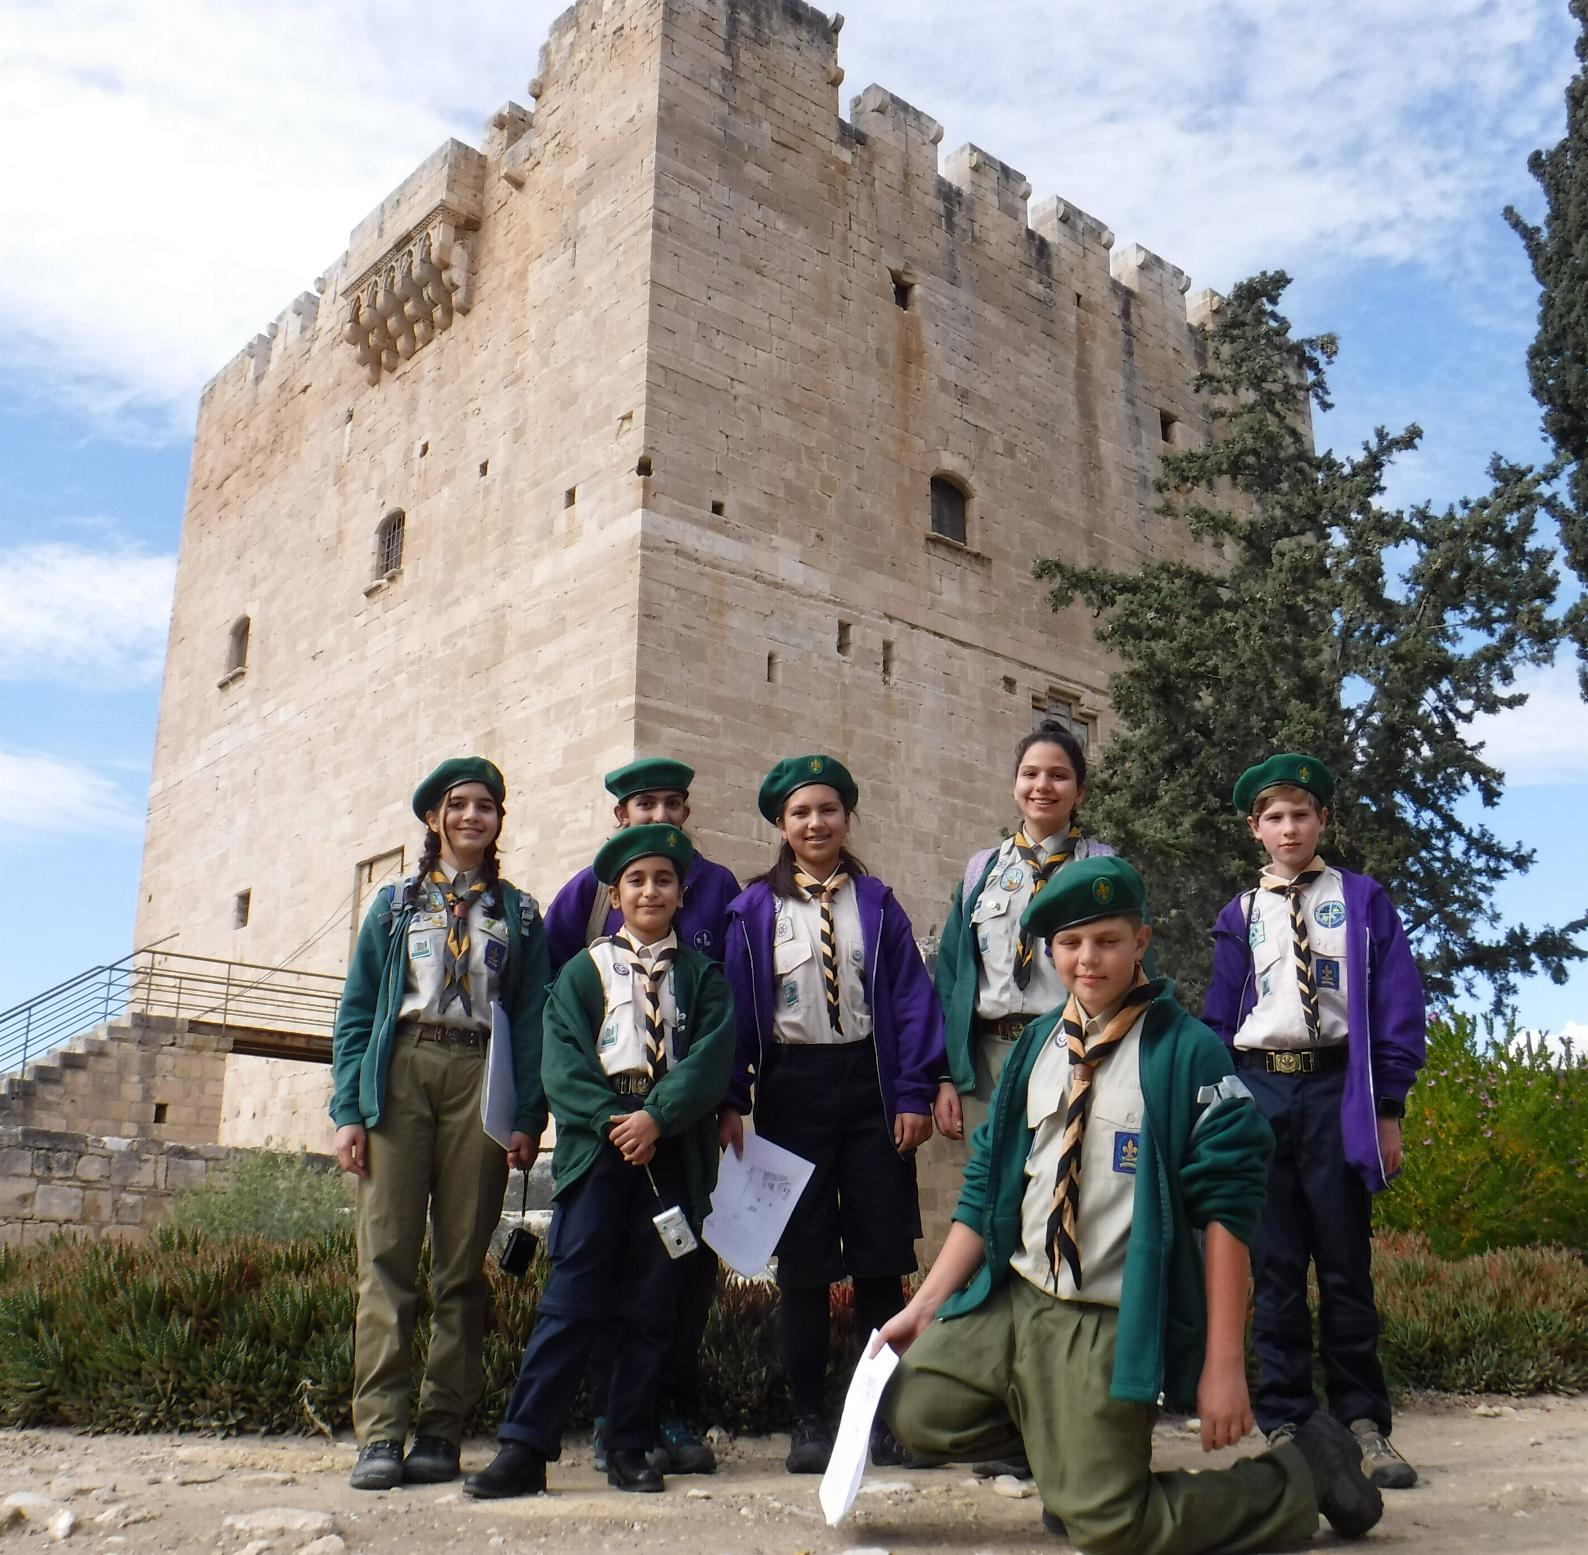 Ashington Group Meeting Hut: Scoutpage